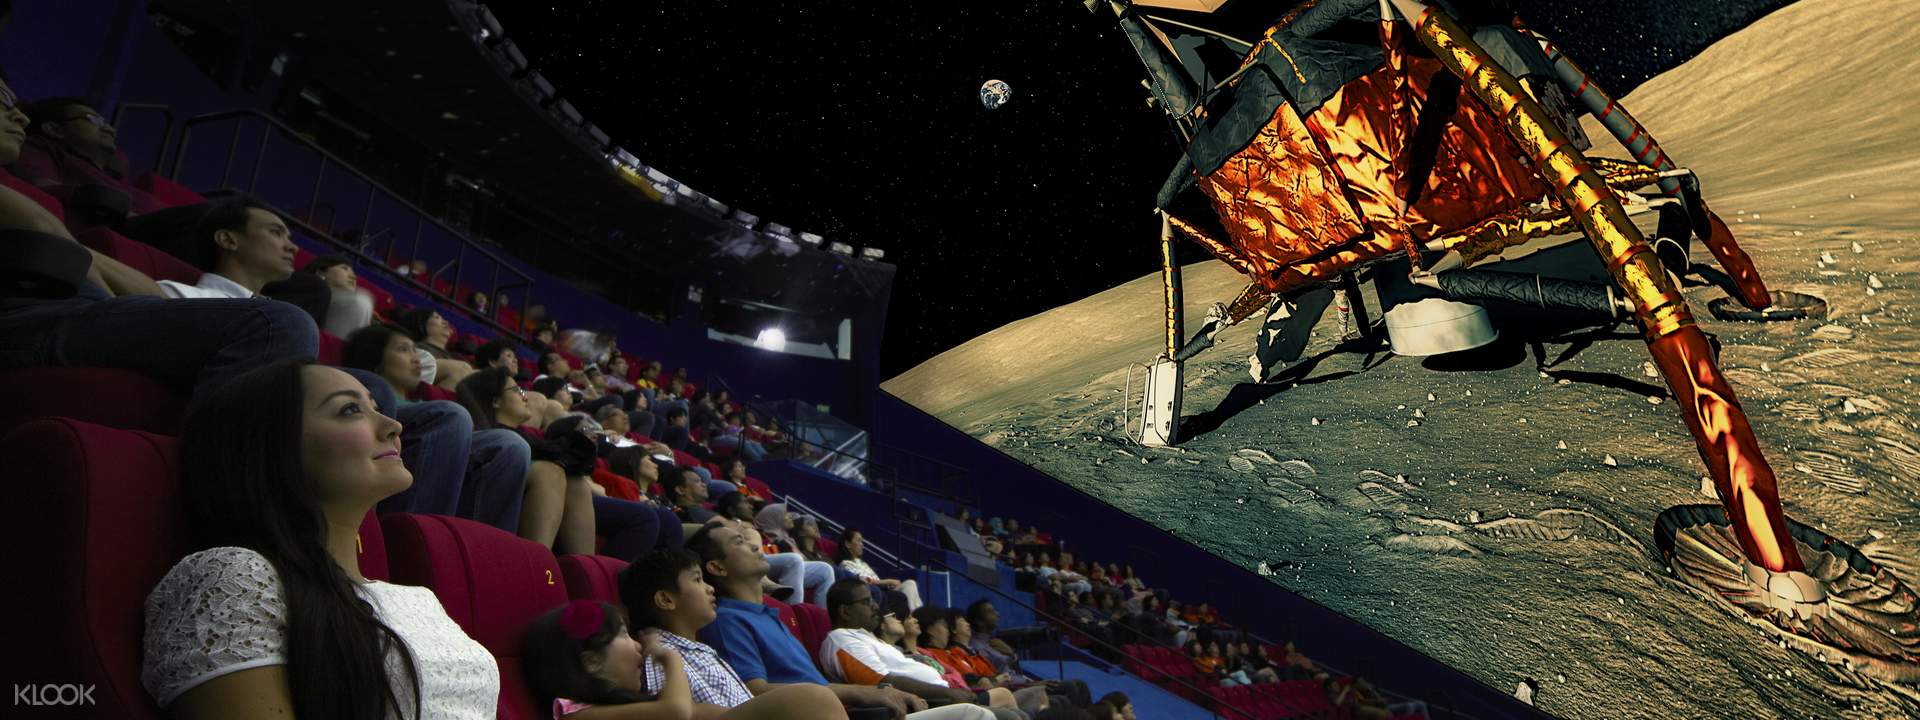 "Science Centre Singapore + Omni Theatre Movie + Butterflies Up-Close"""